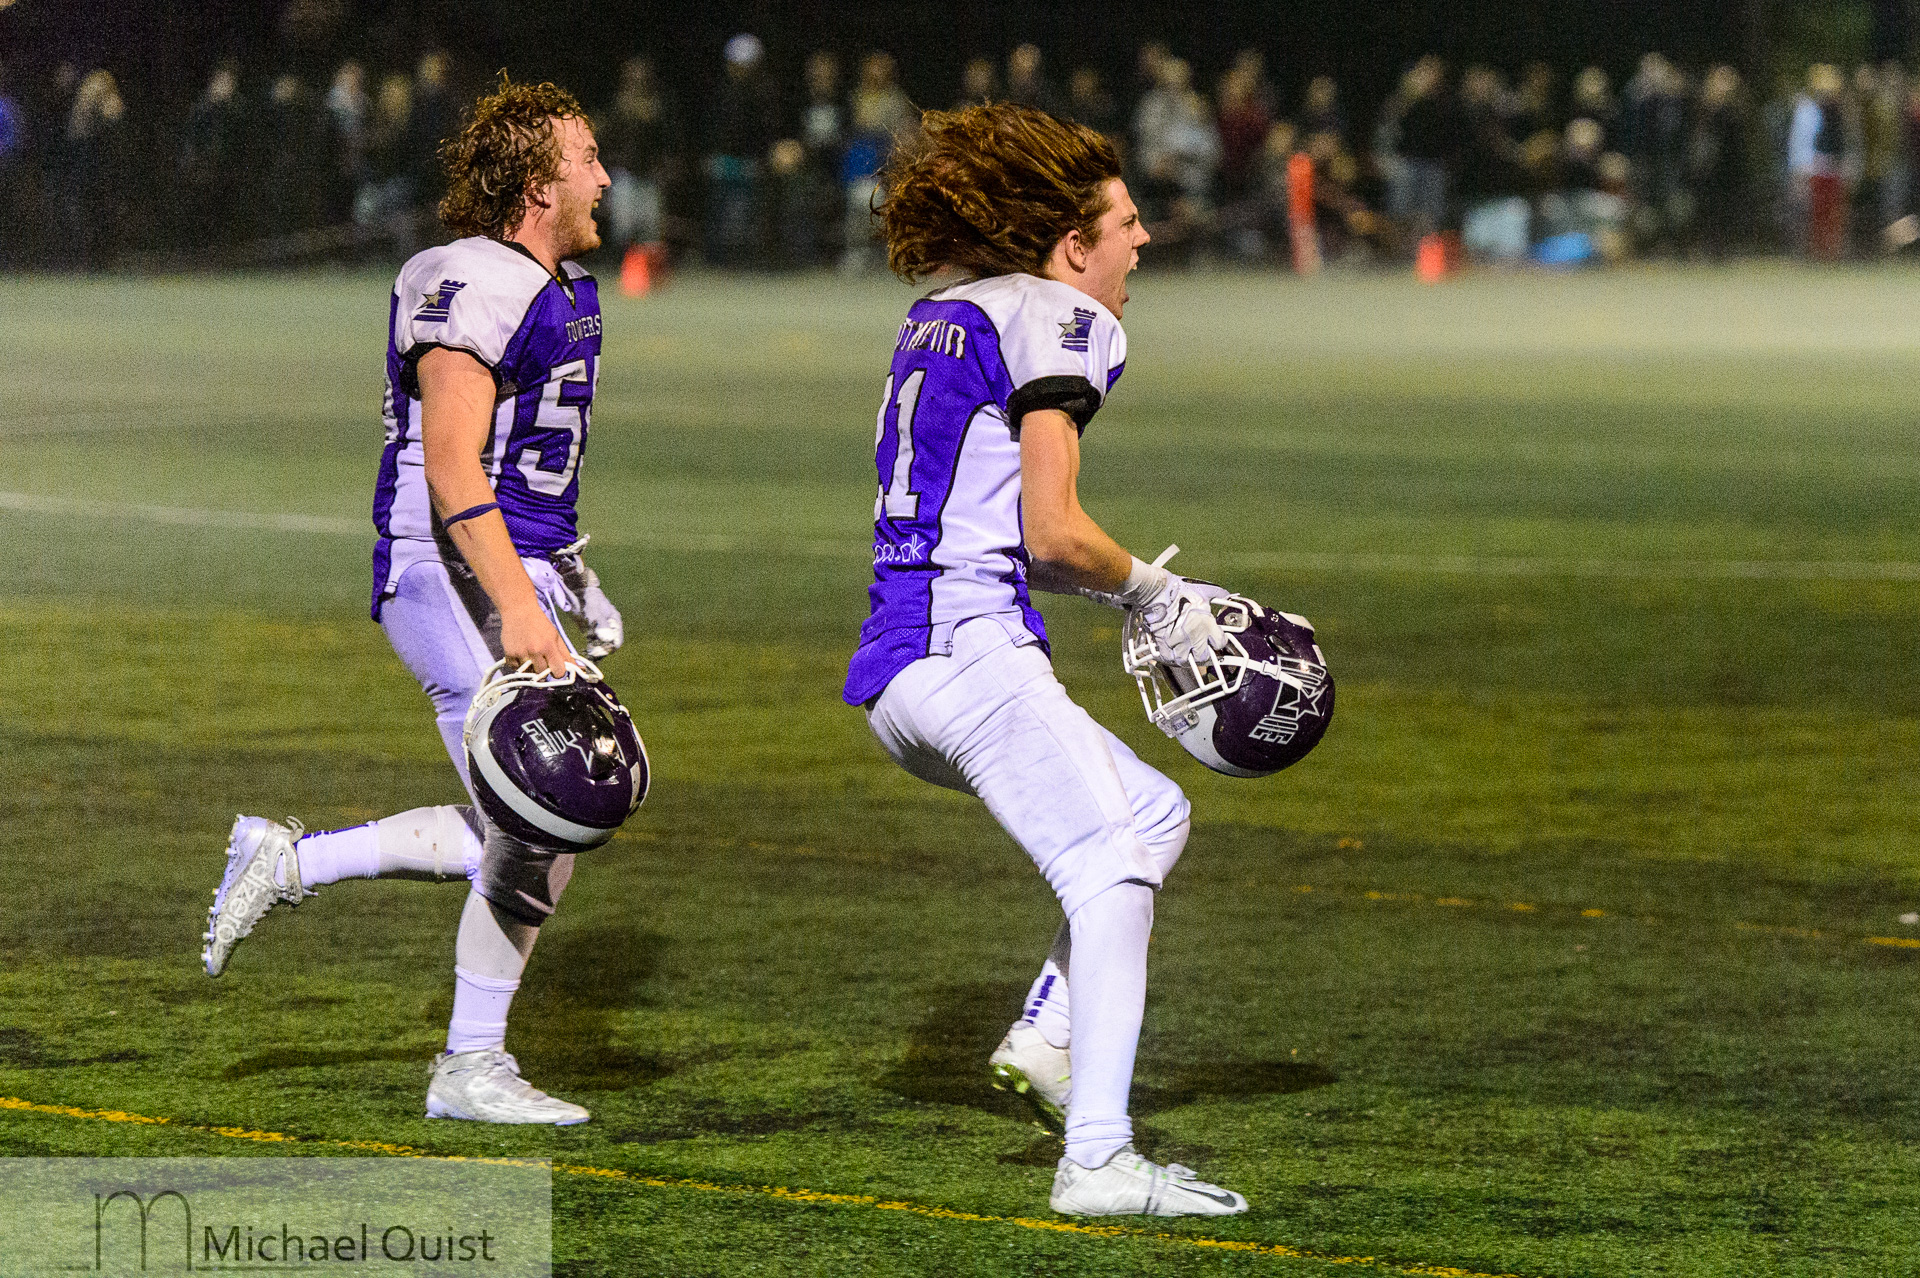 Junior-Bowl-2015-Copenhagen-Towers-vs-Herlev-Rebels-219